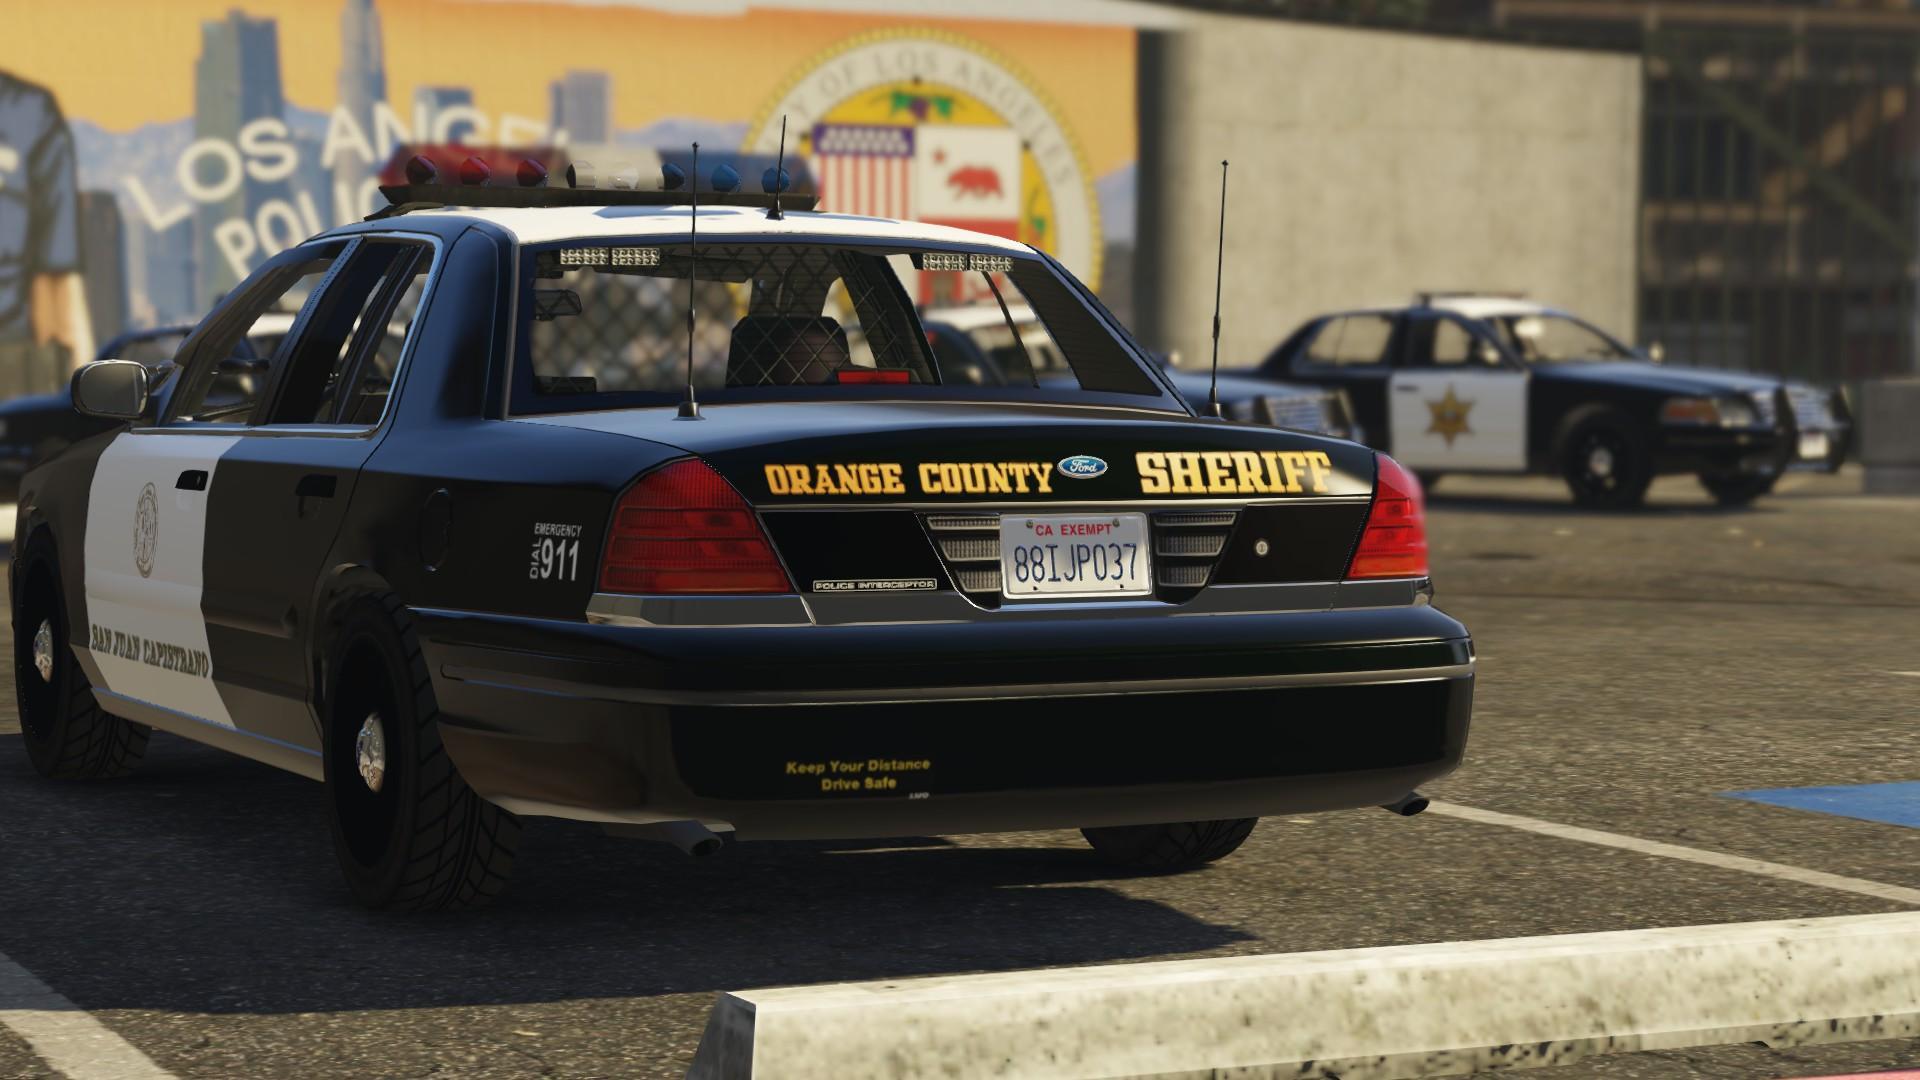 Orange County Sheriff Chp Black Interior Realism